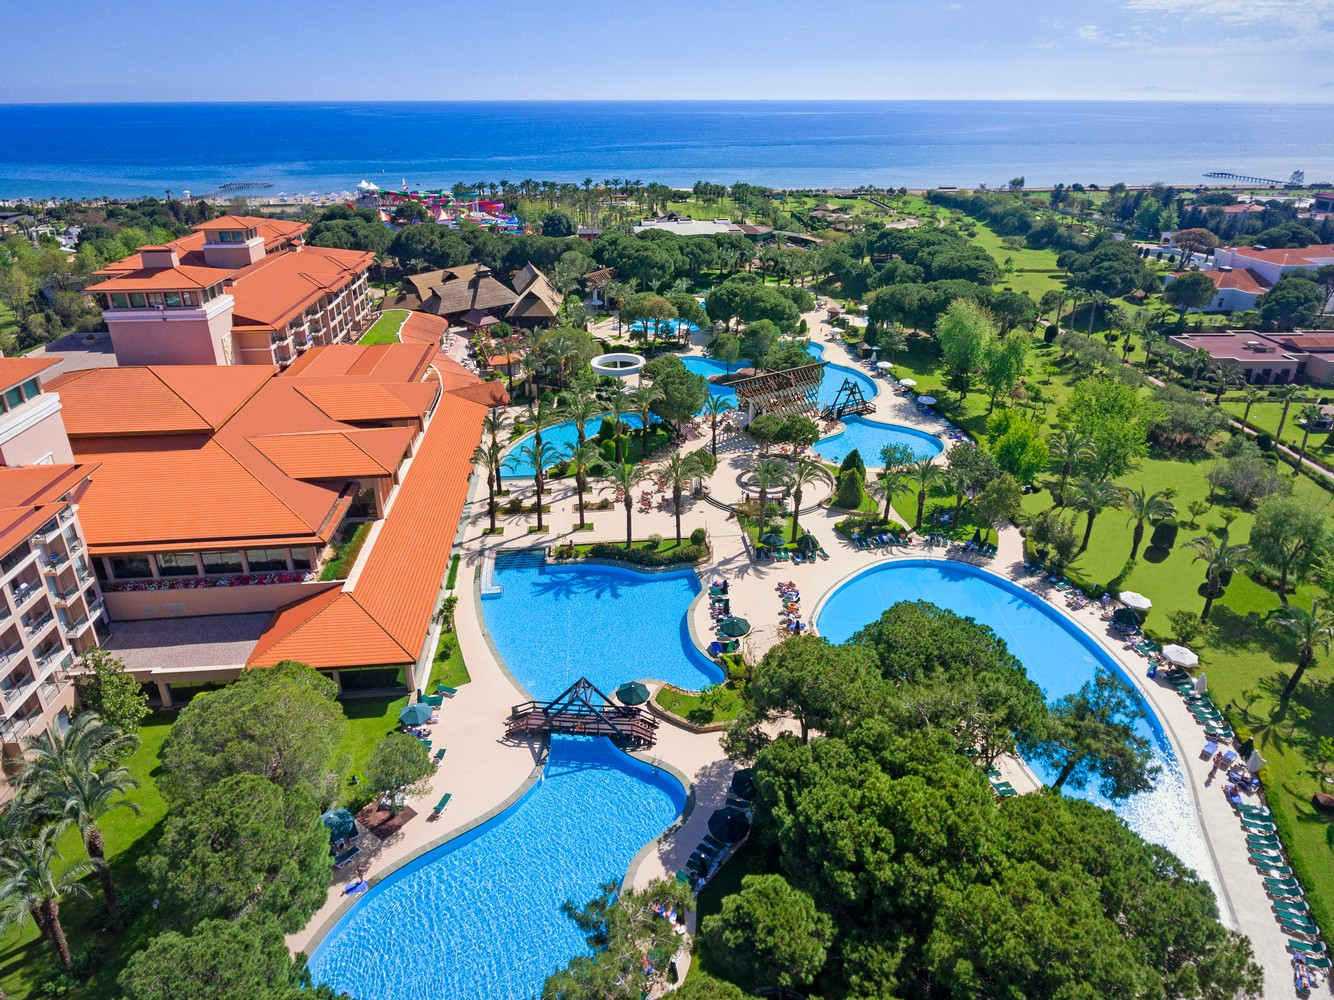 ic_hotels_green_palace_general_view_1.jpg